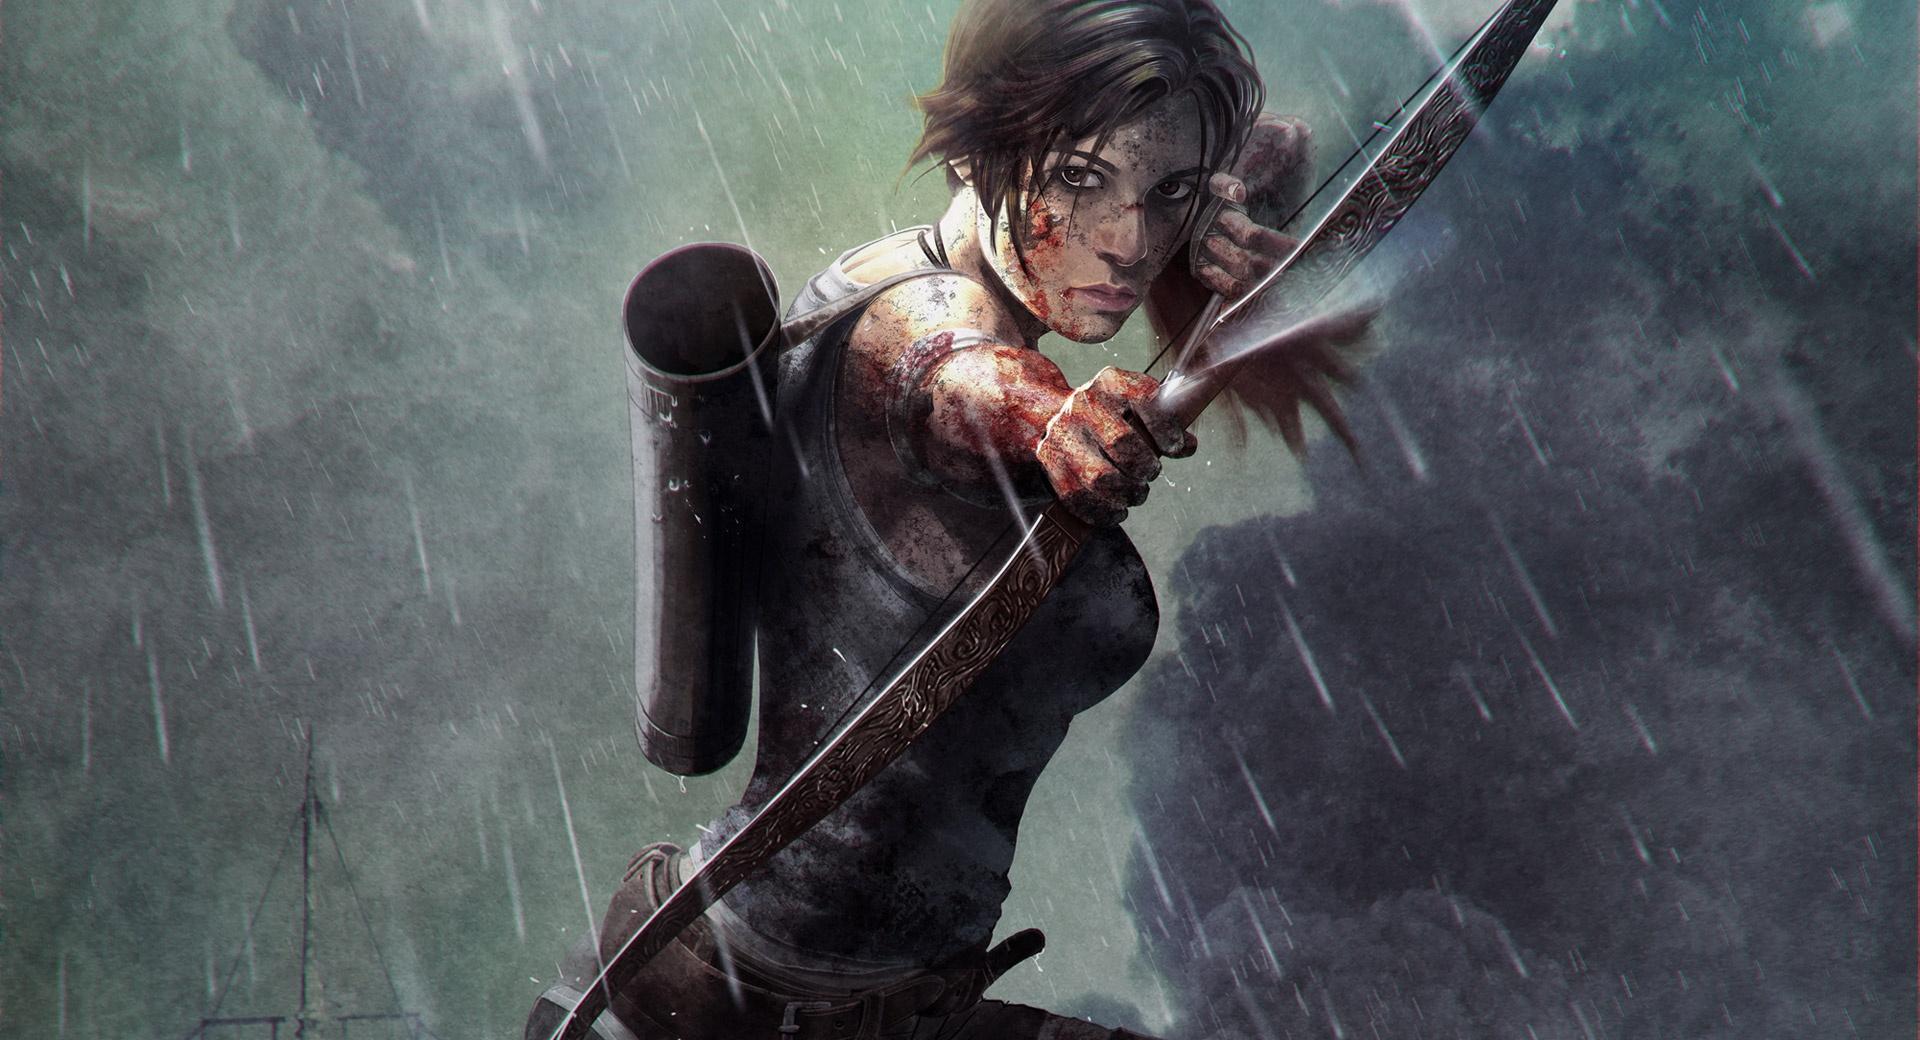 Tomb Raider Fan Art wallpapers HD quality